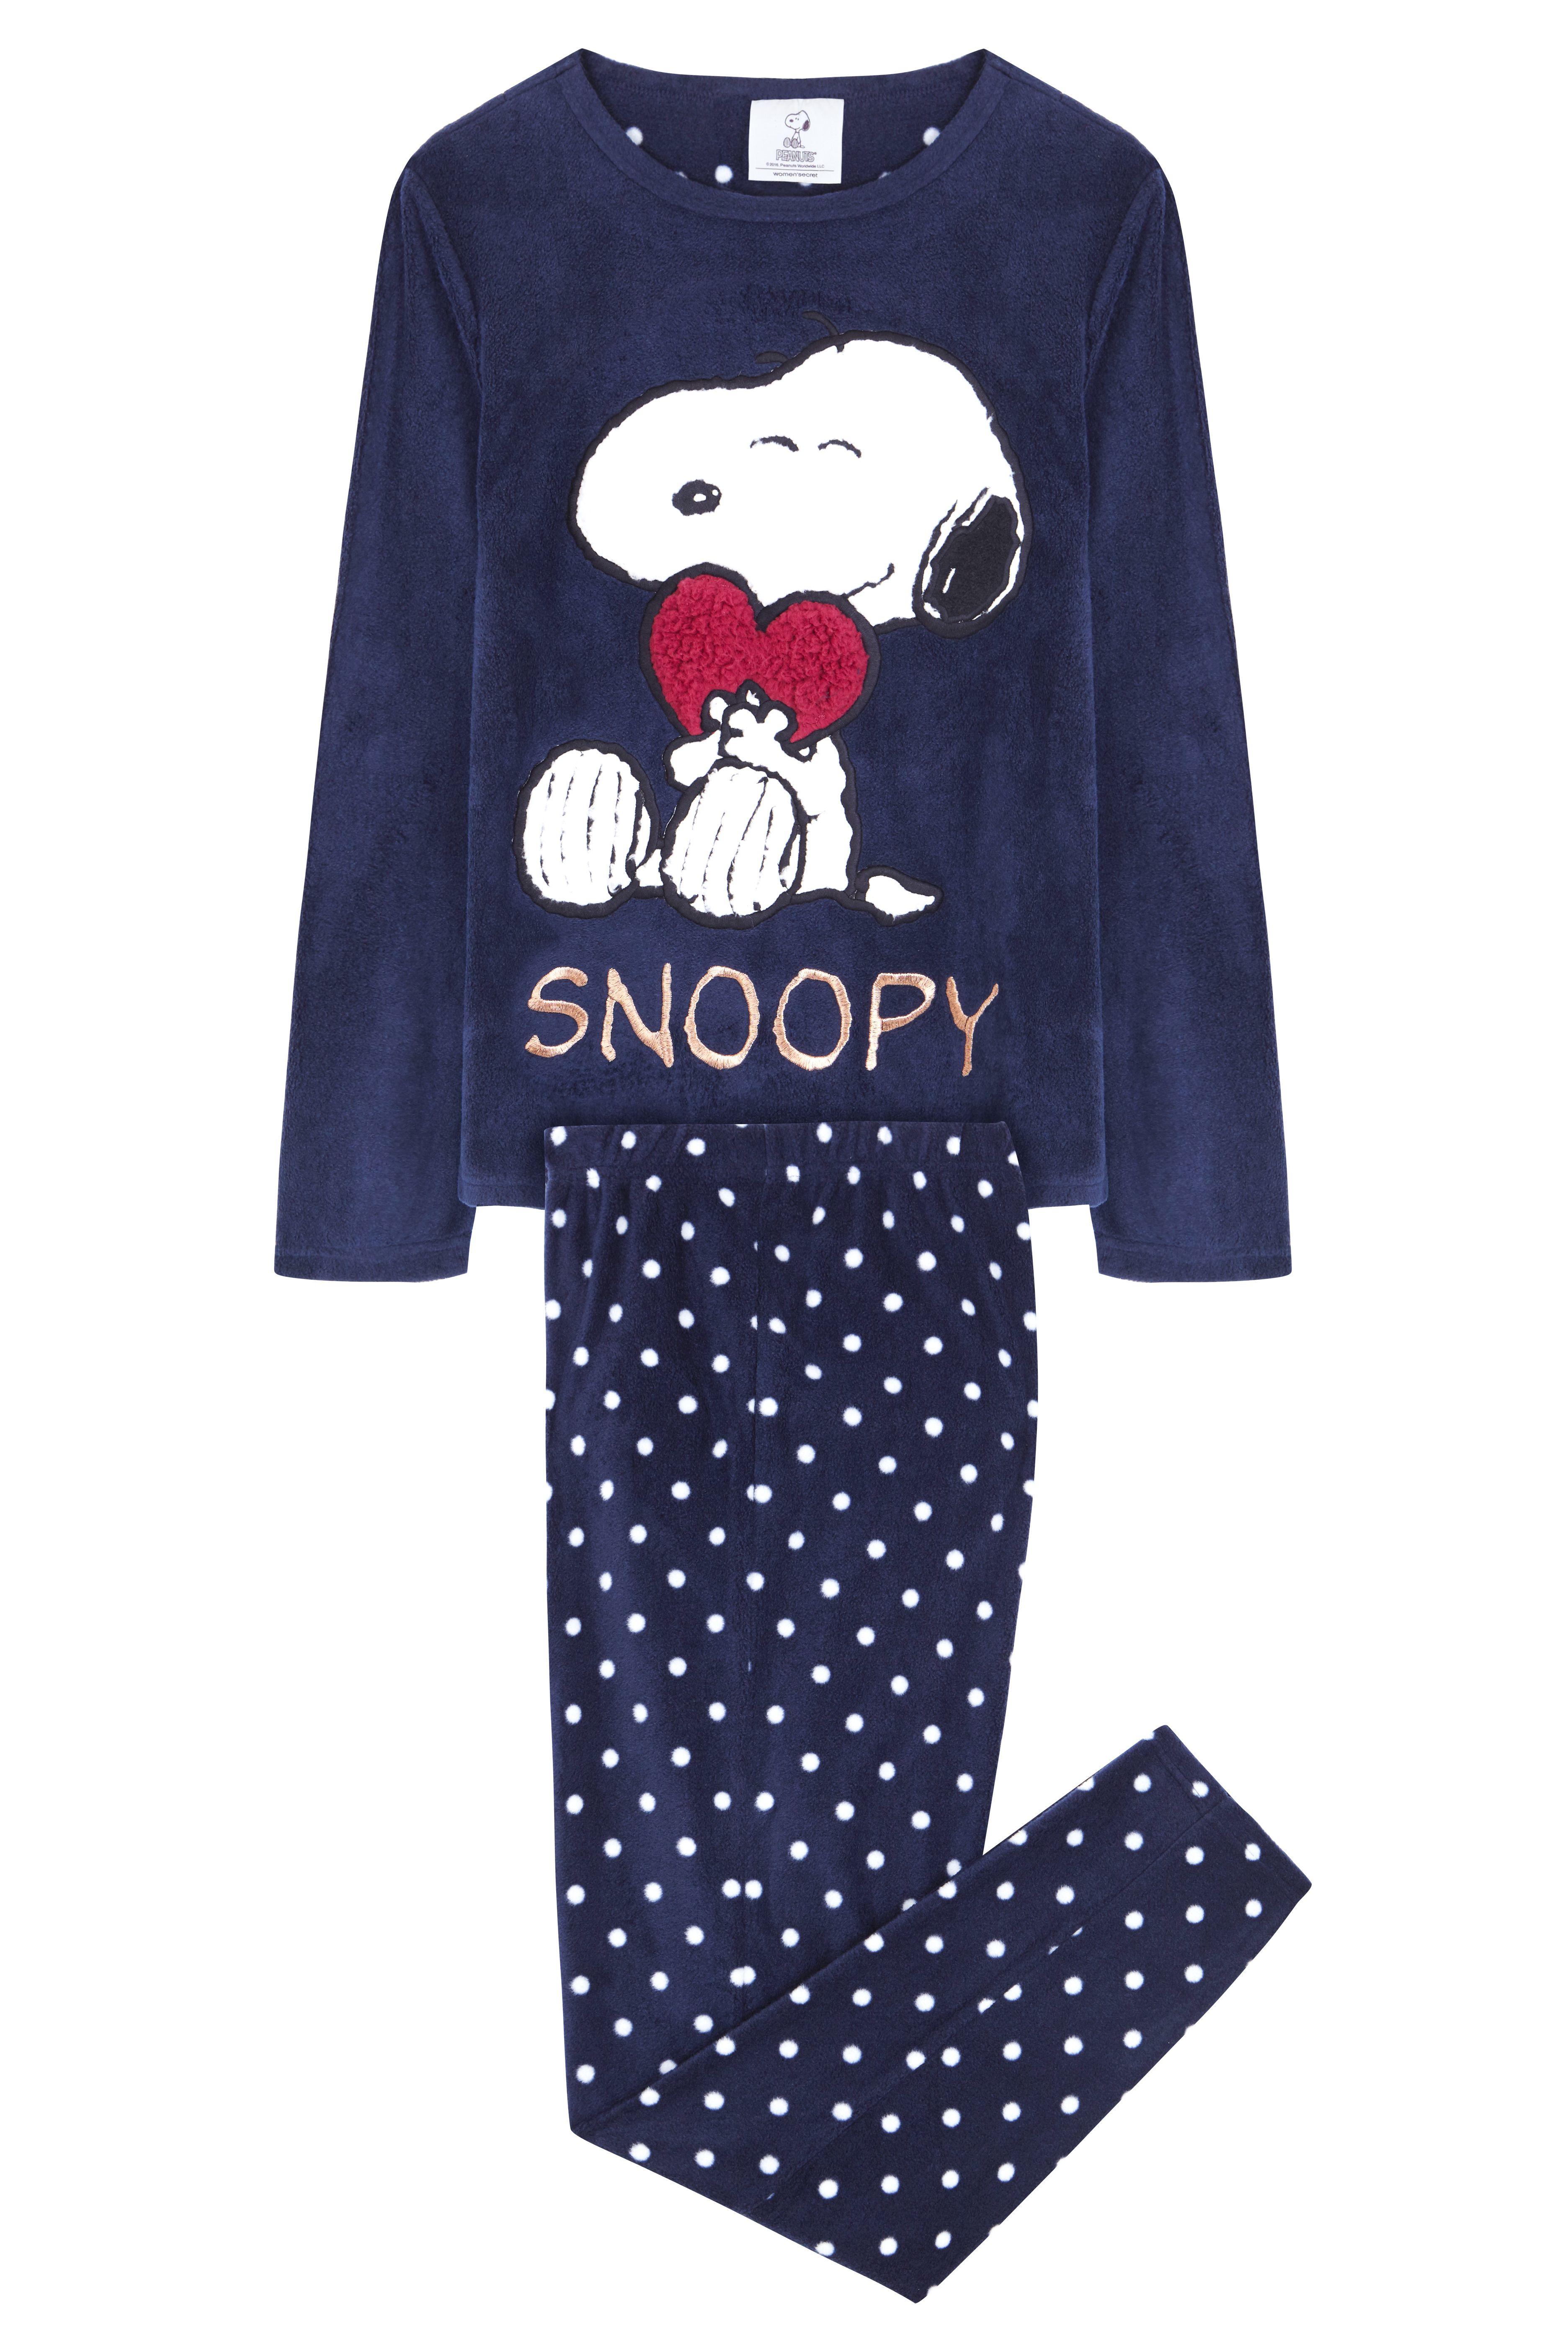 Snoopy long pyjama @womensecret by @womensecret   WS♡ details ...